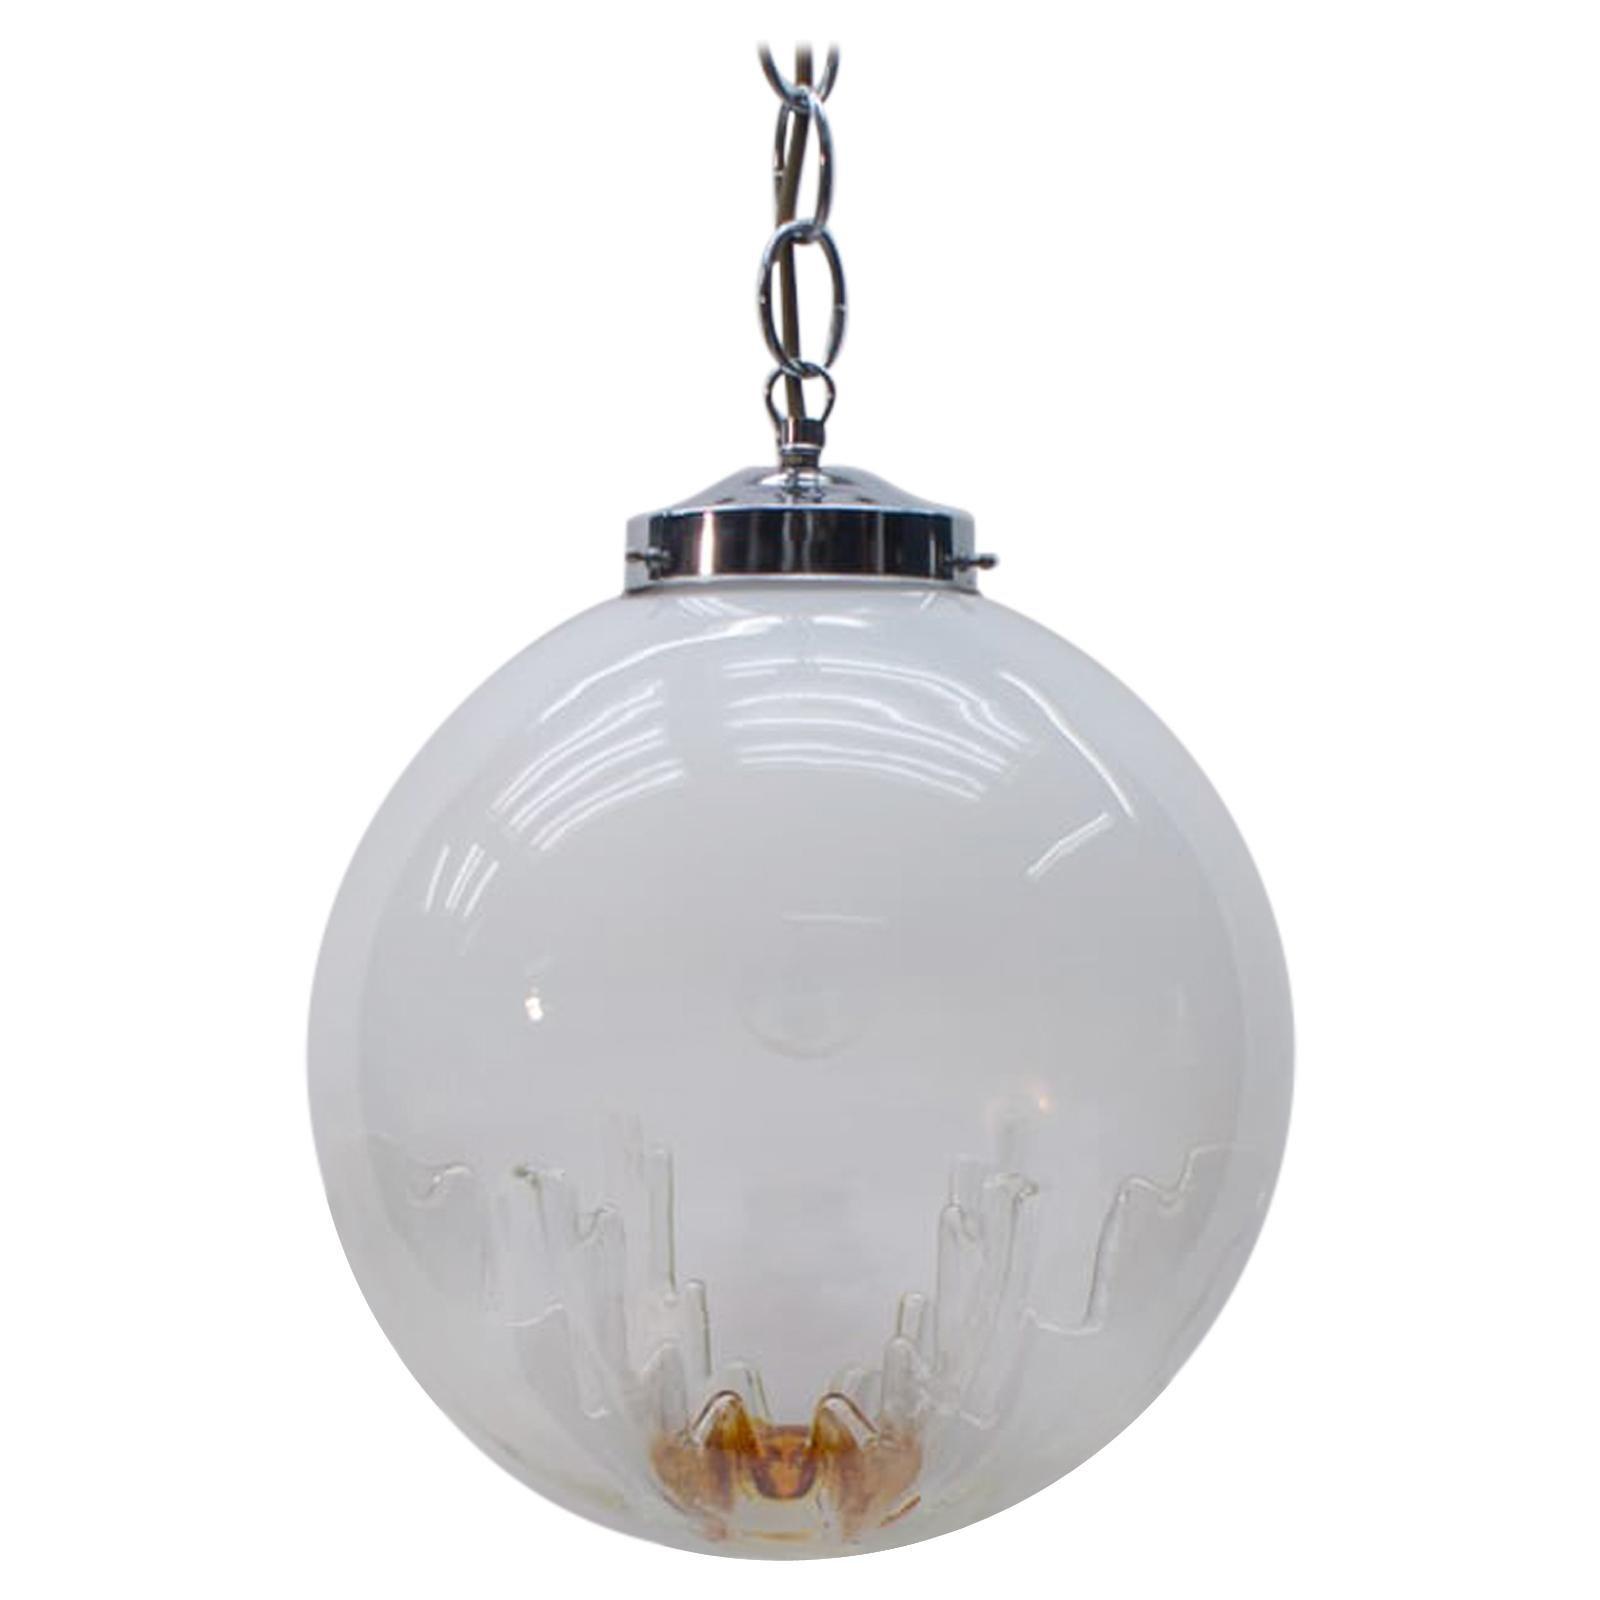 Huge Murano Mazzega Glass Globe Ceiling Lamp, 1960s, Italy